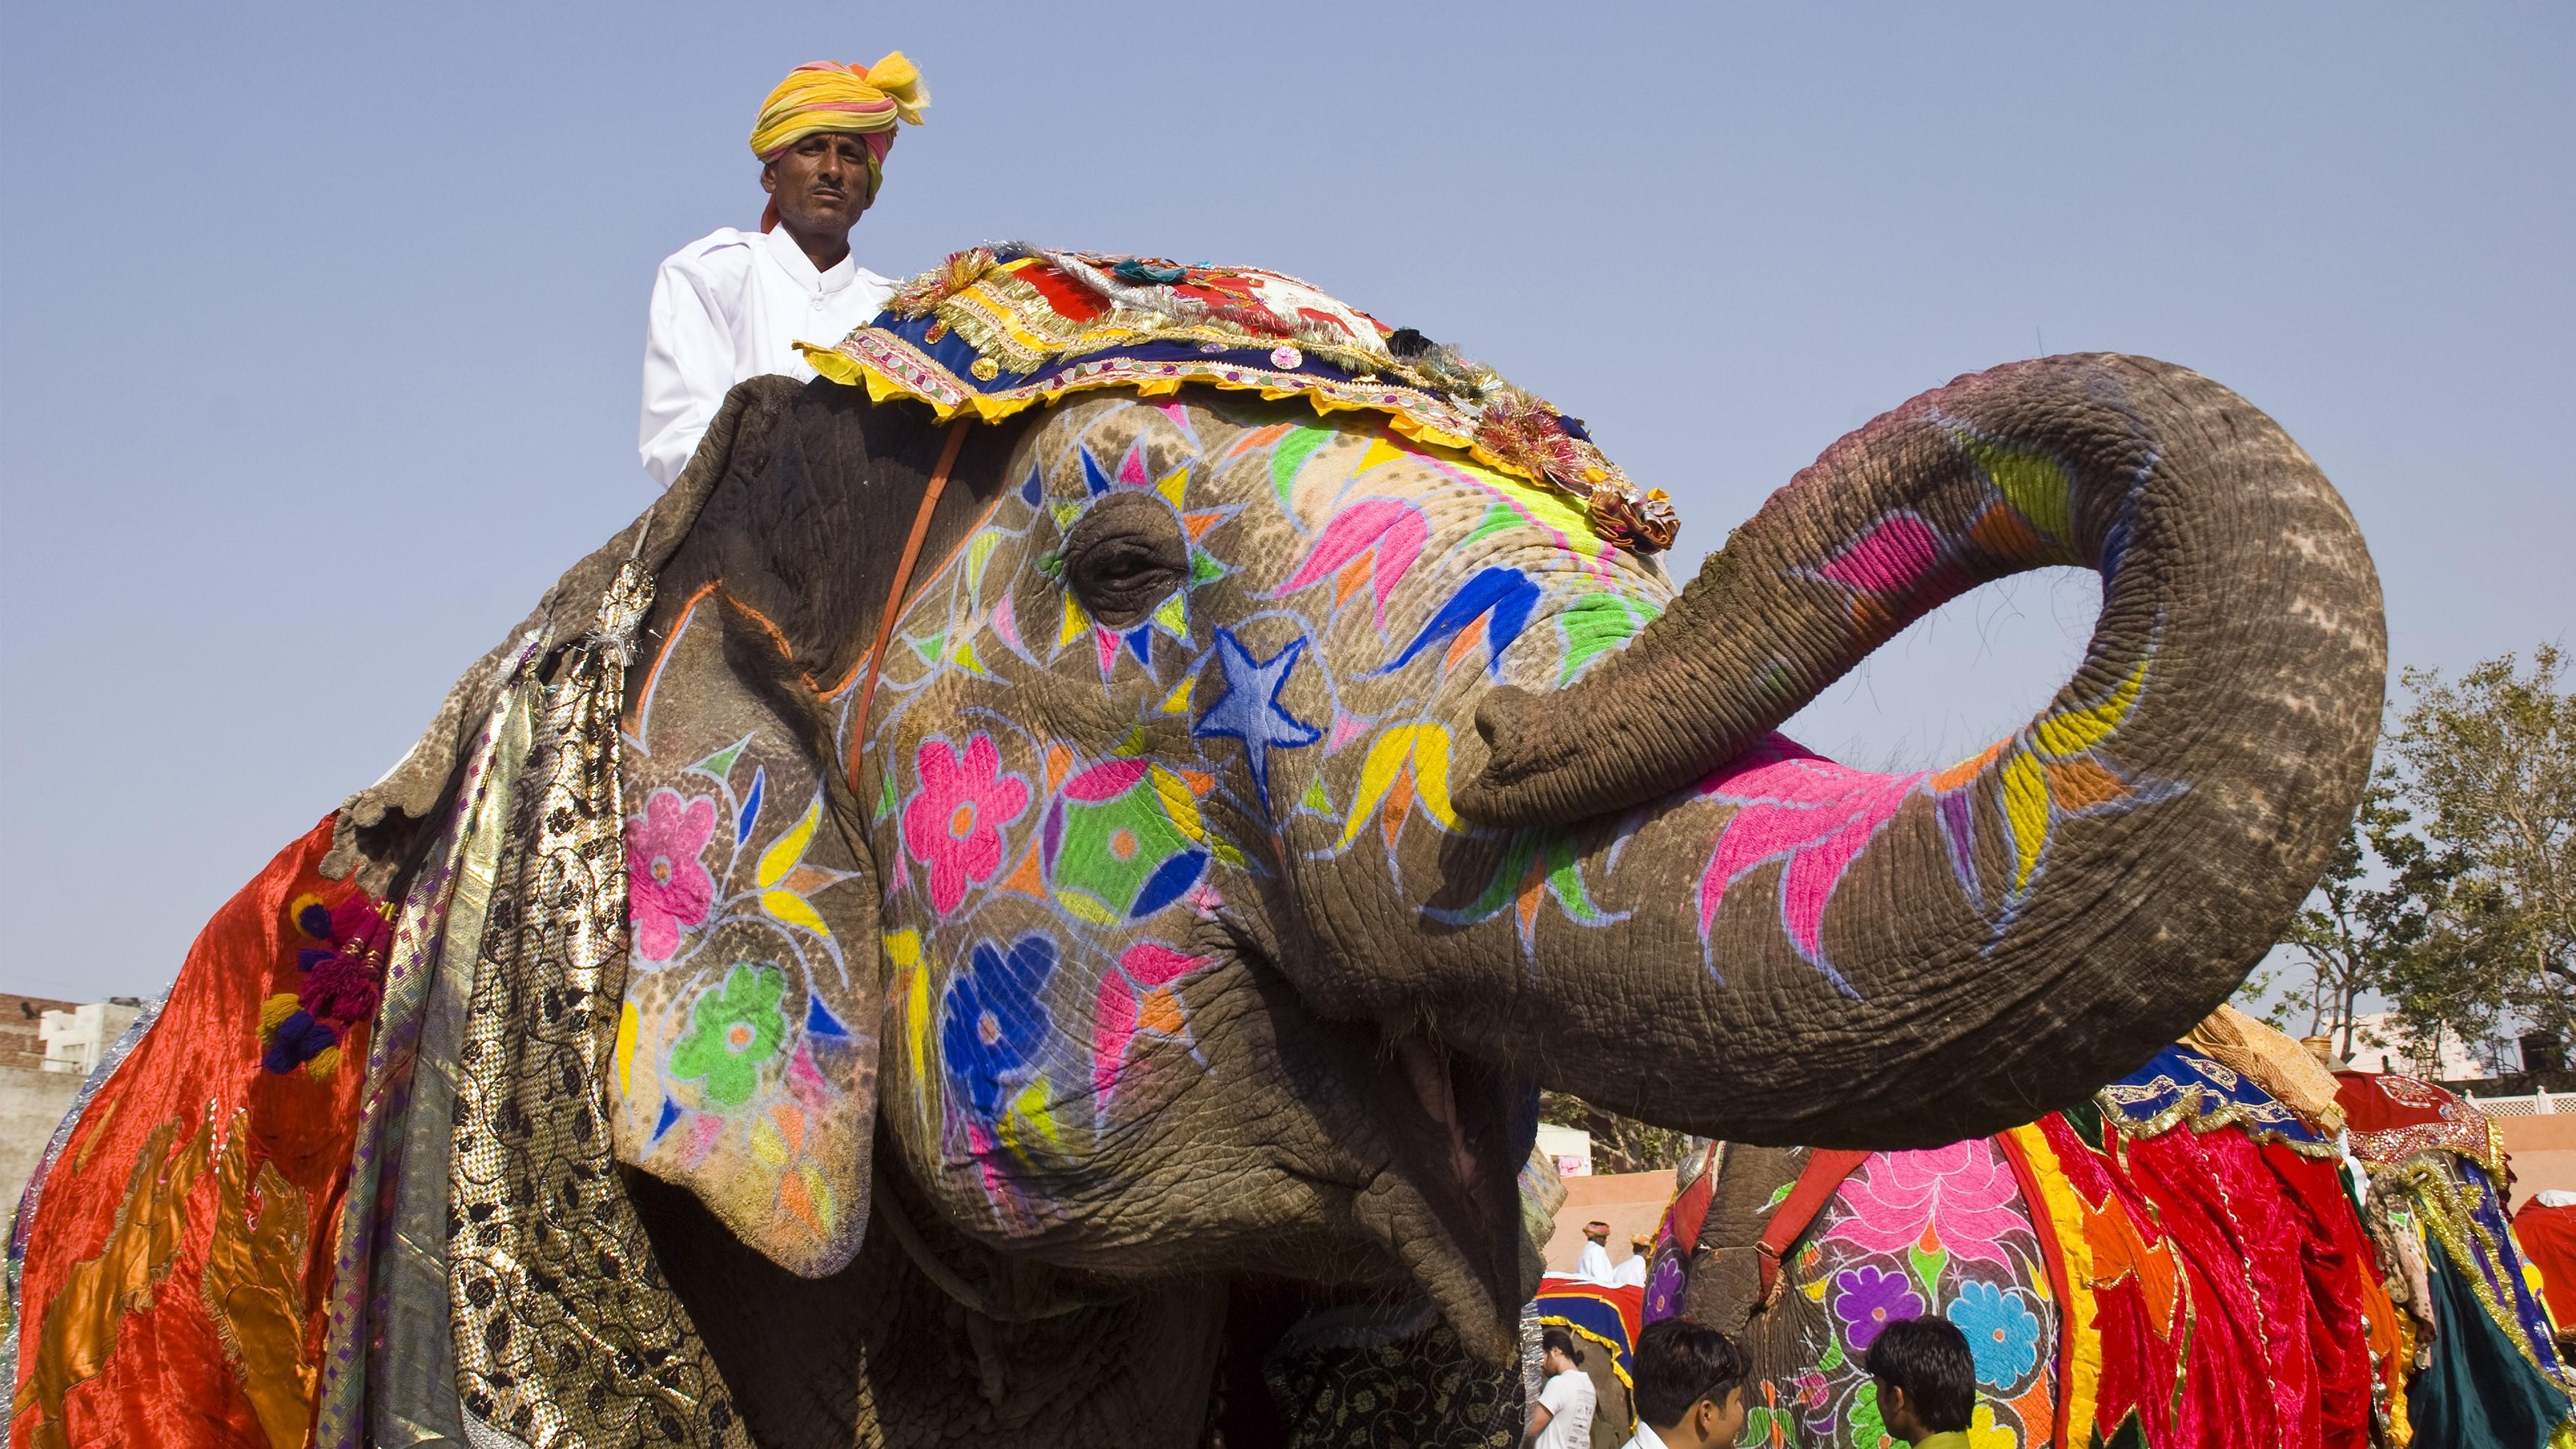 Decorated Elephant, Rajasthan 16-9